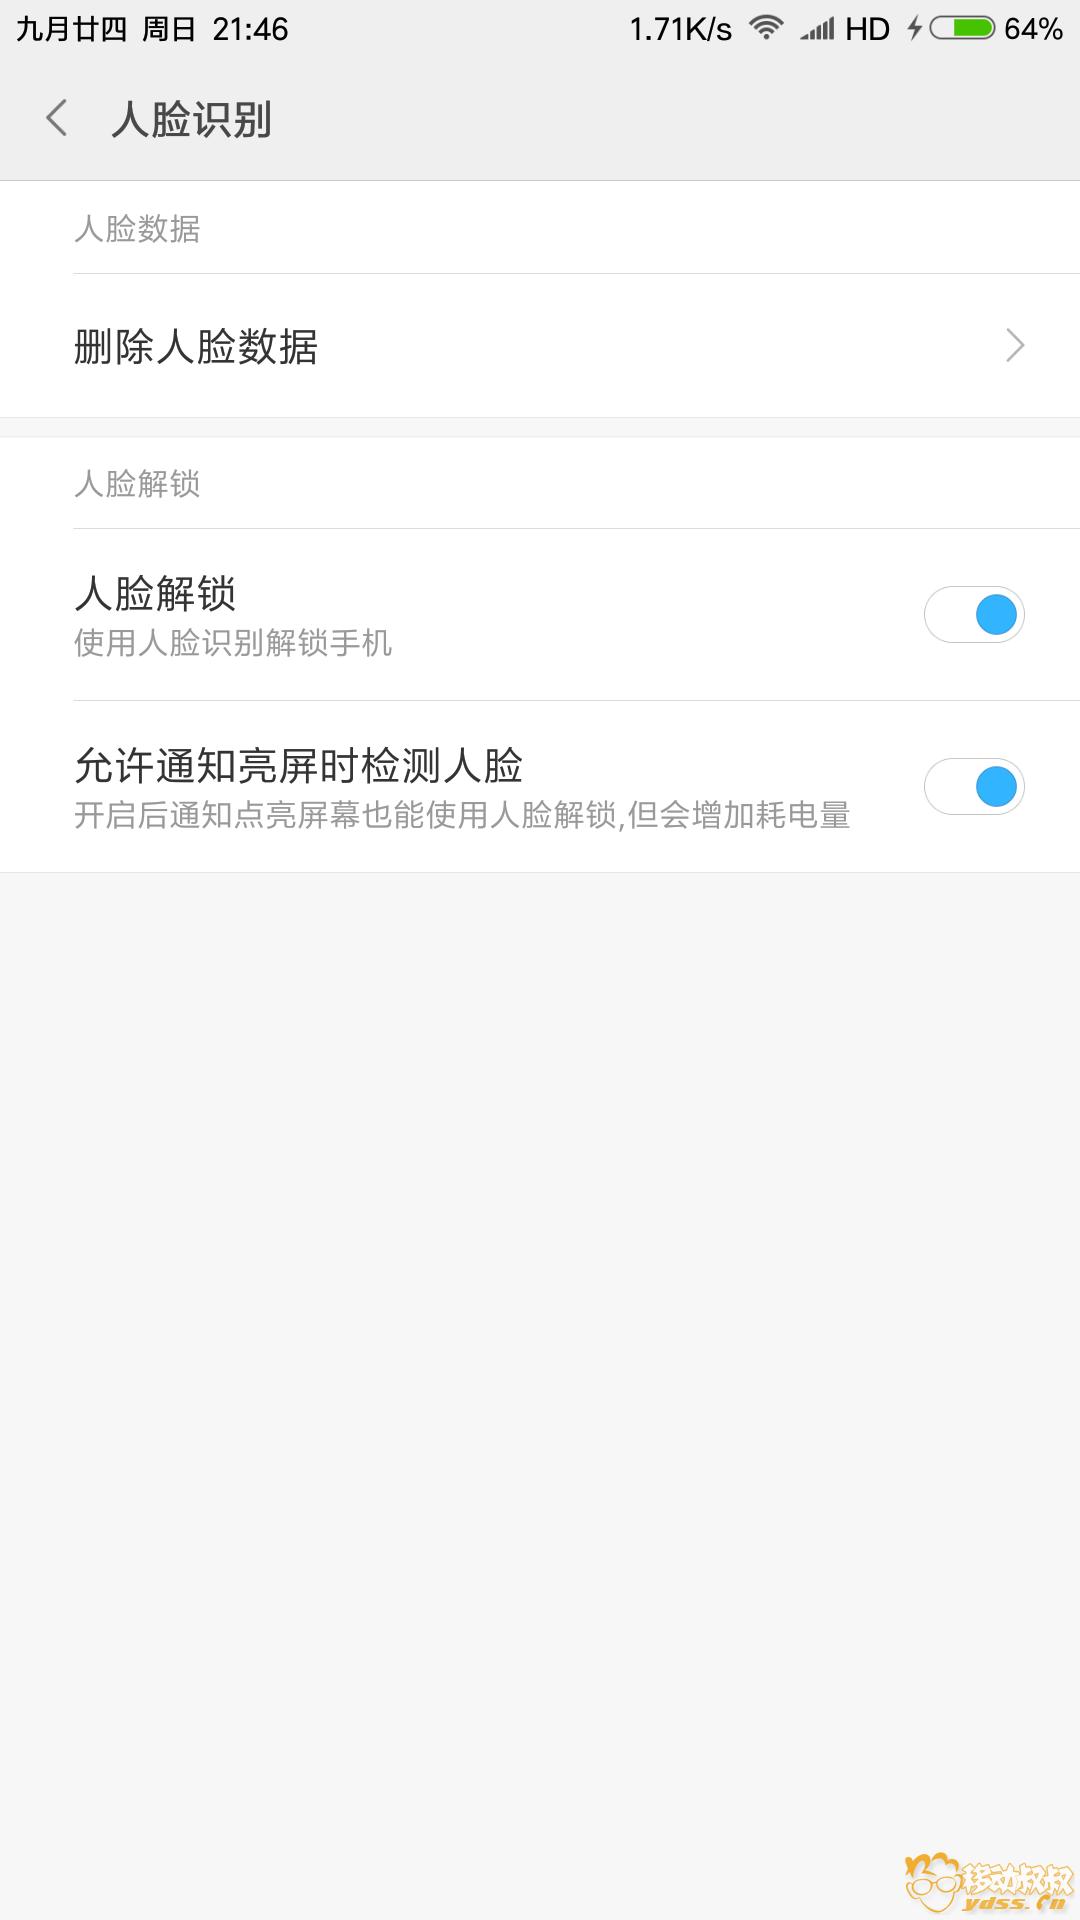 Screenshot_2017-11-12-21-46-11-059_com.android.keyguard.png